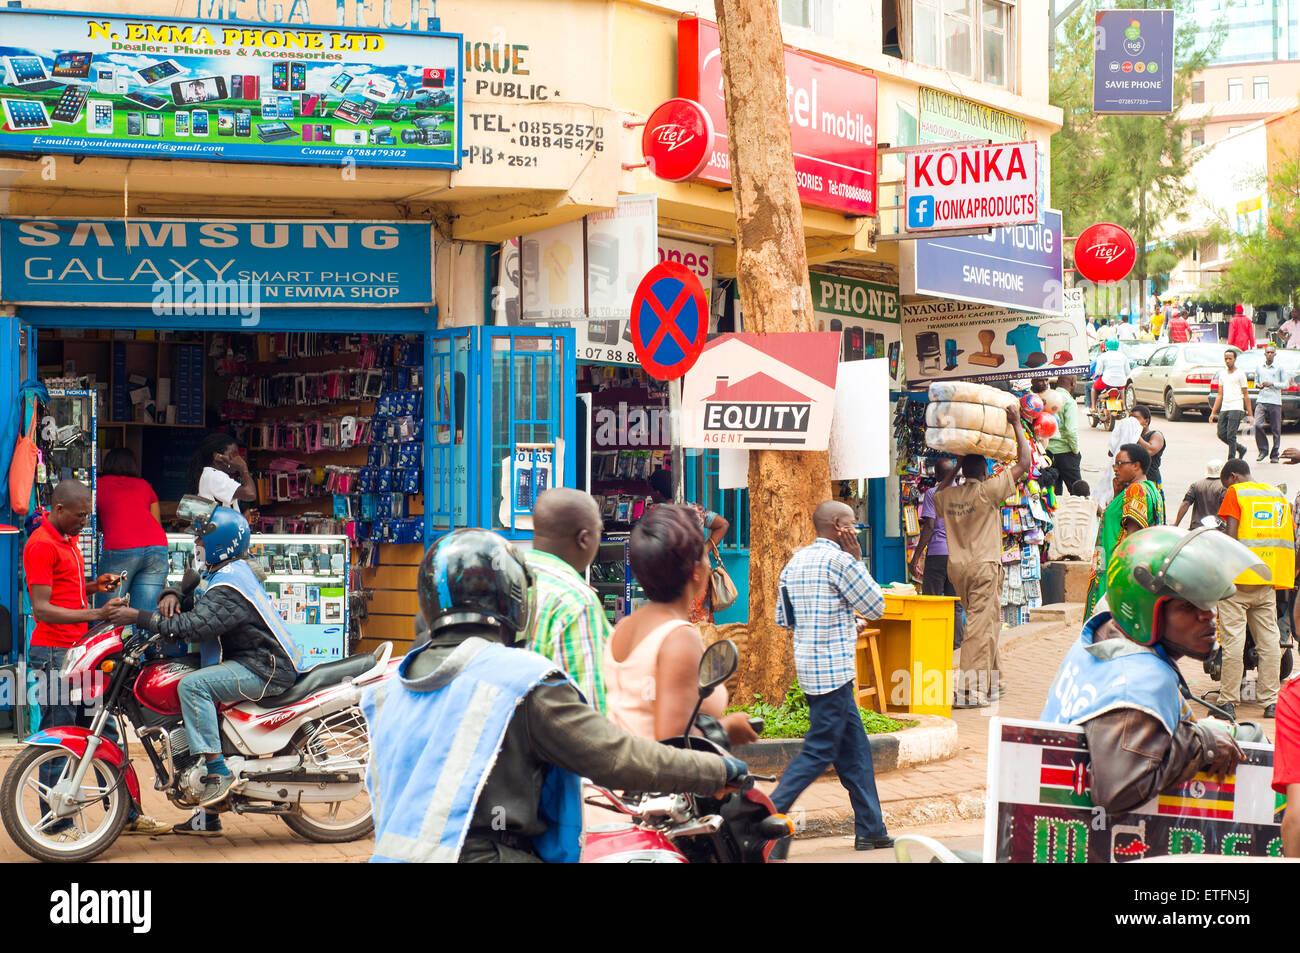 Street scene, KN 2 Street, 'Central Ville', CBD, Kigali, Rwanda - Stock Image